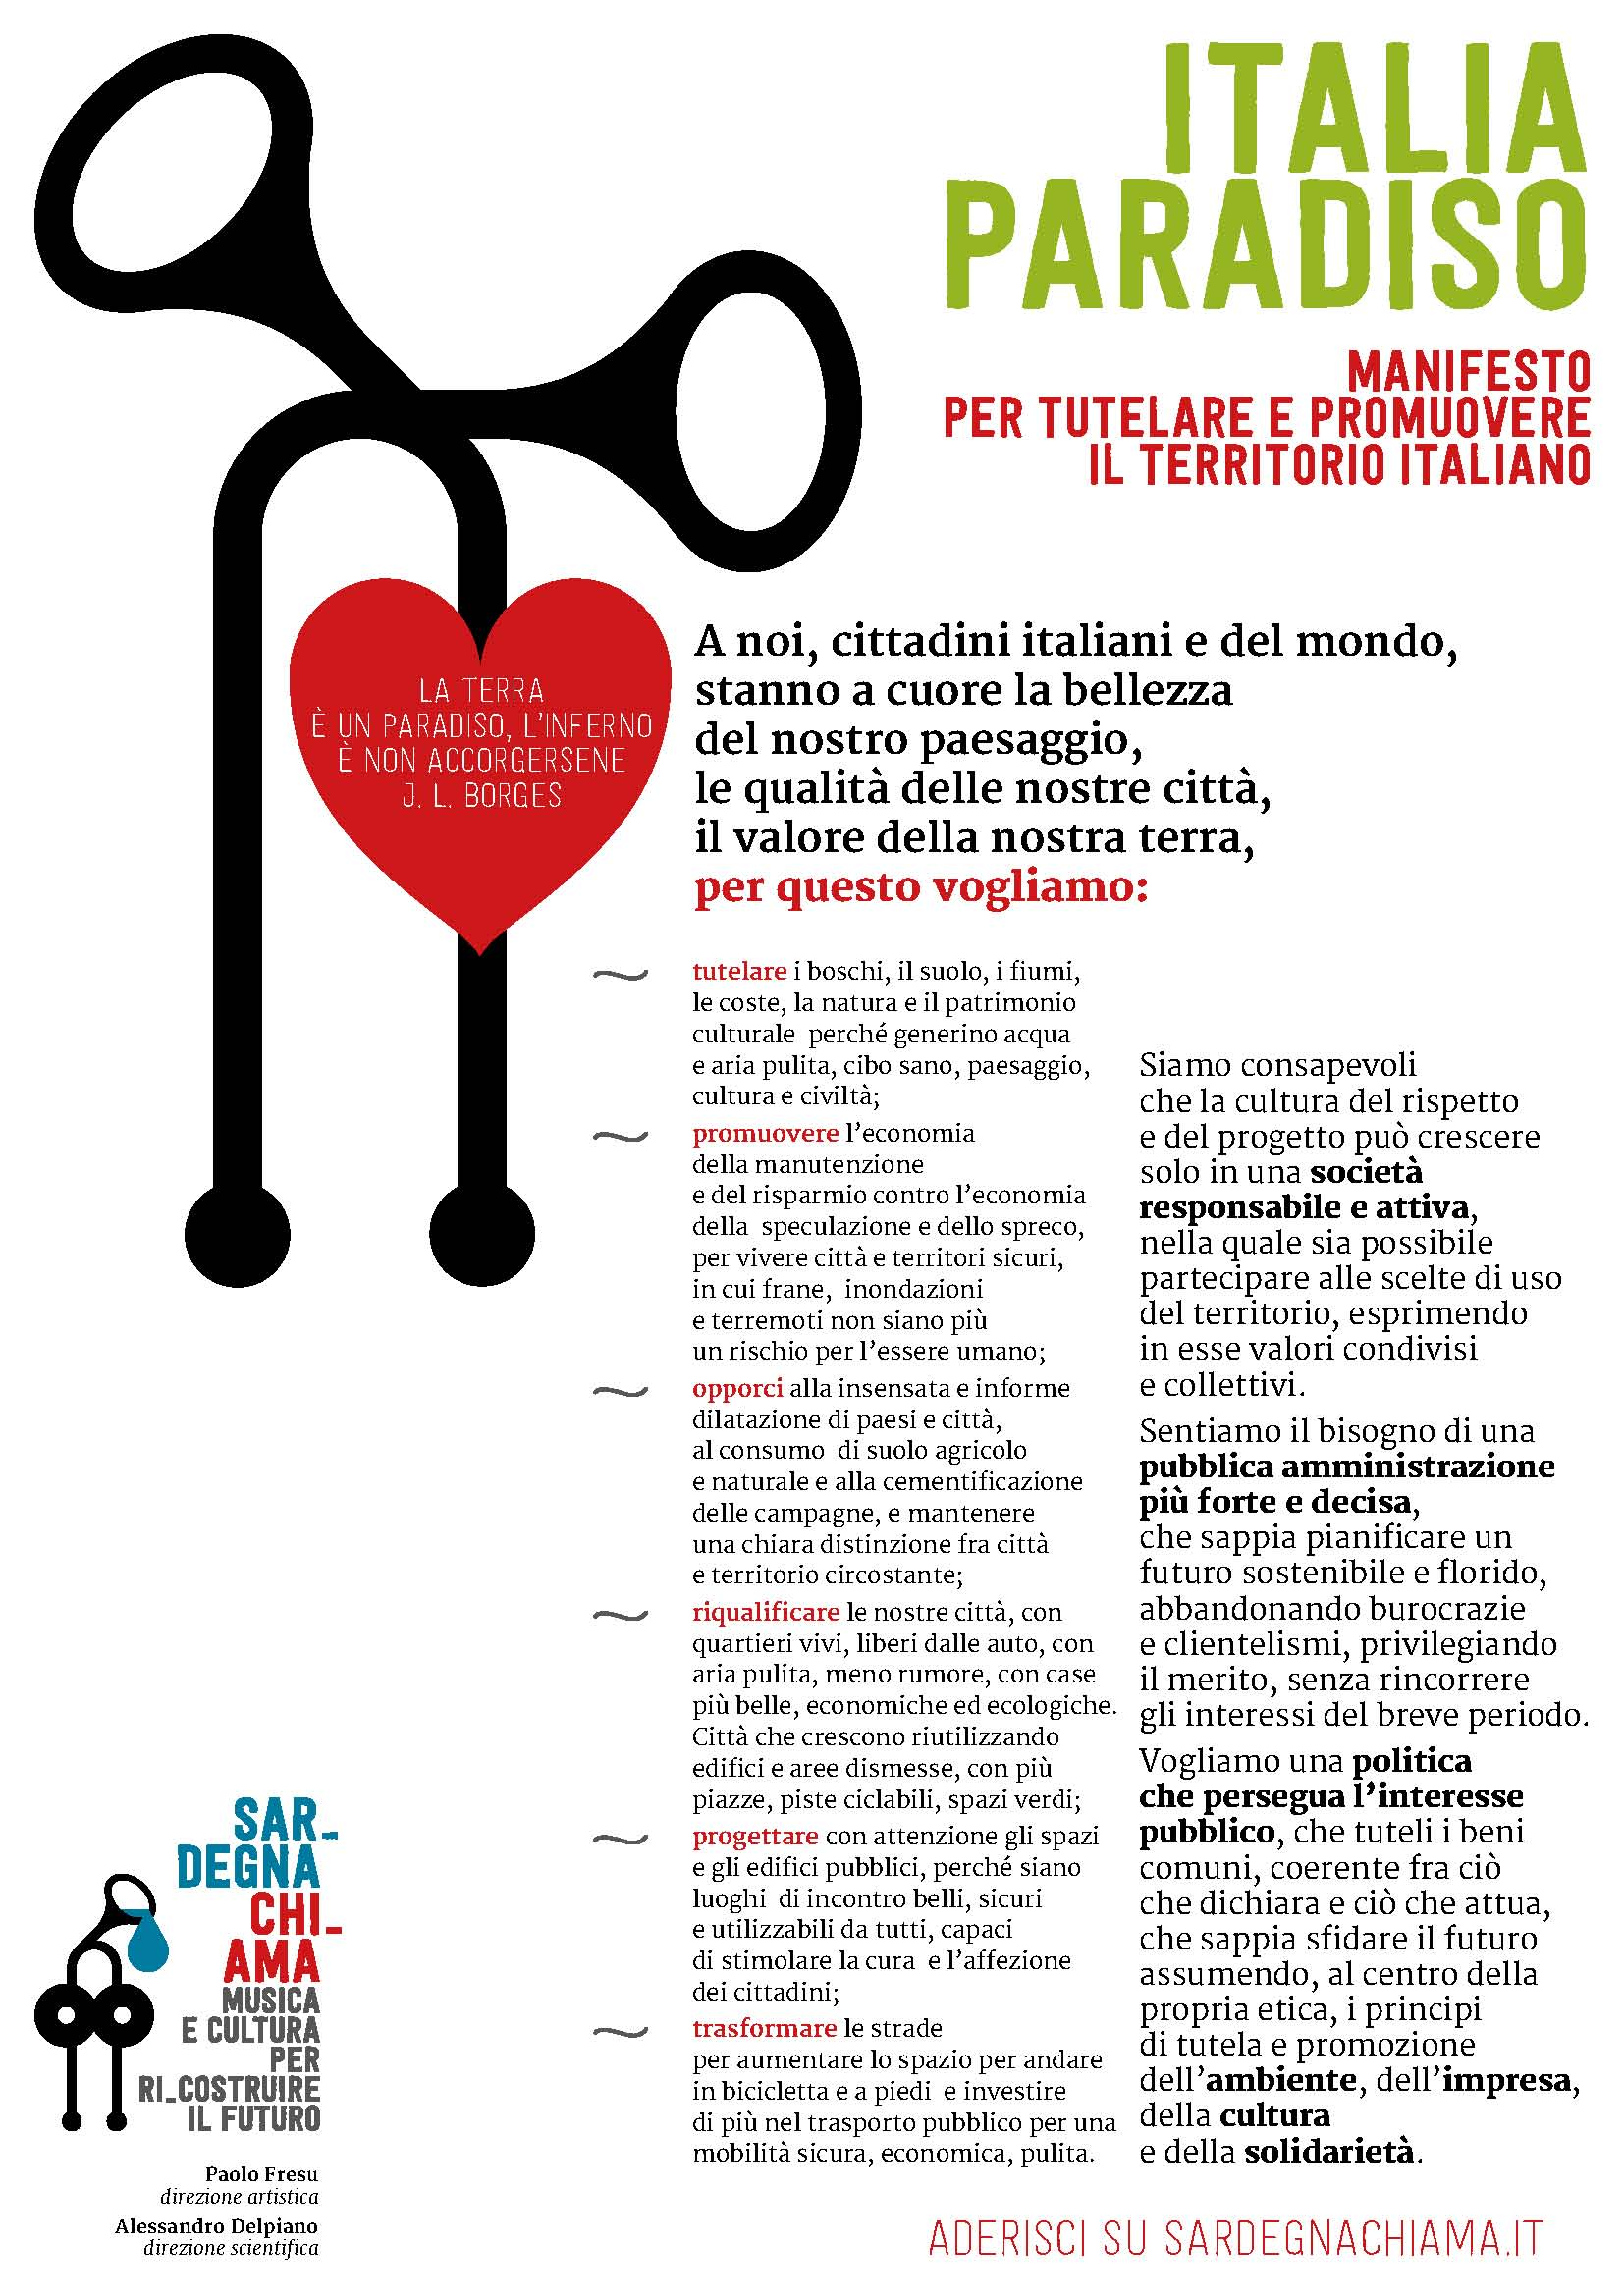 manifesto sardegna chi_ama votazione on-line